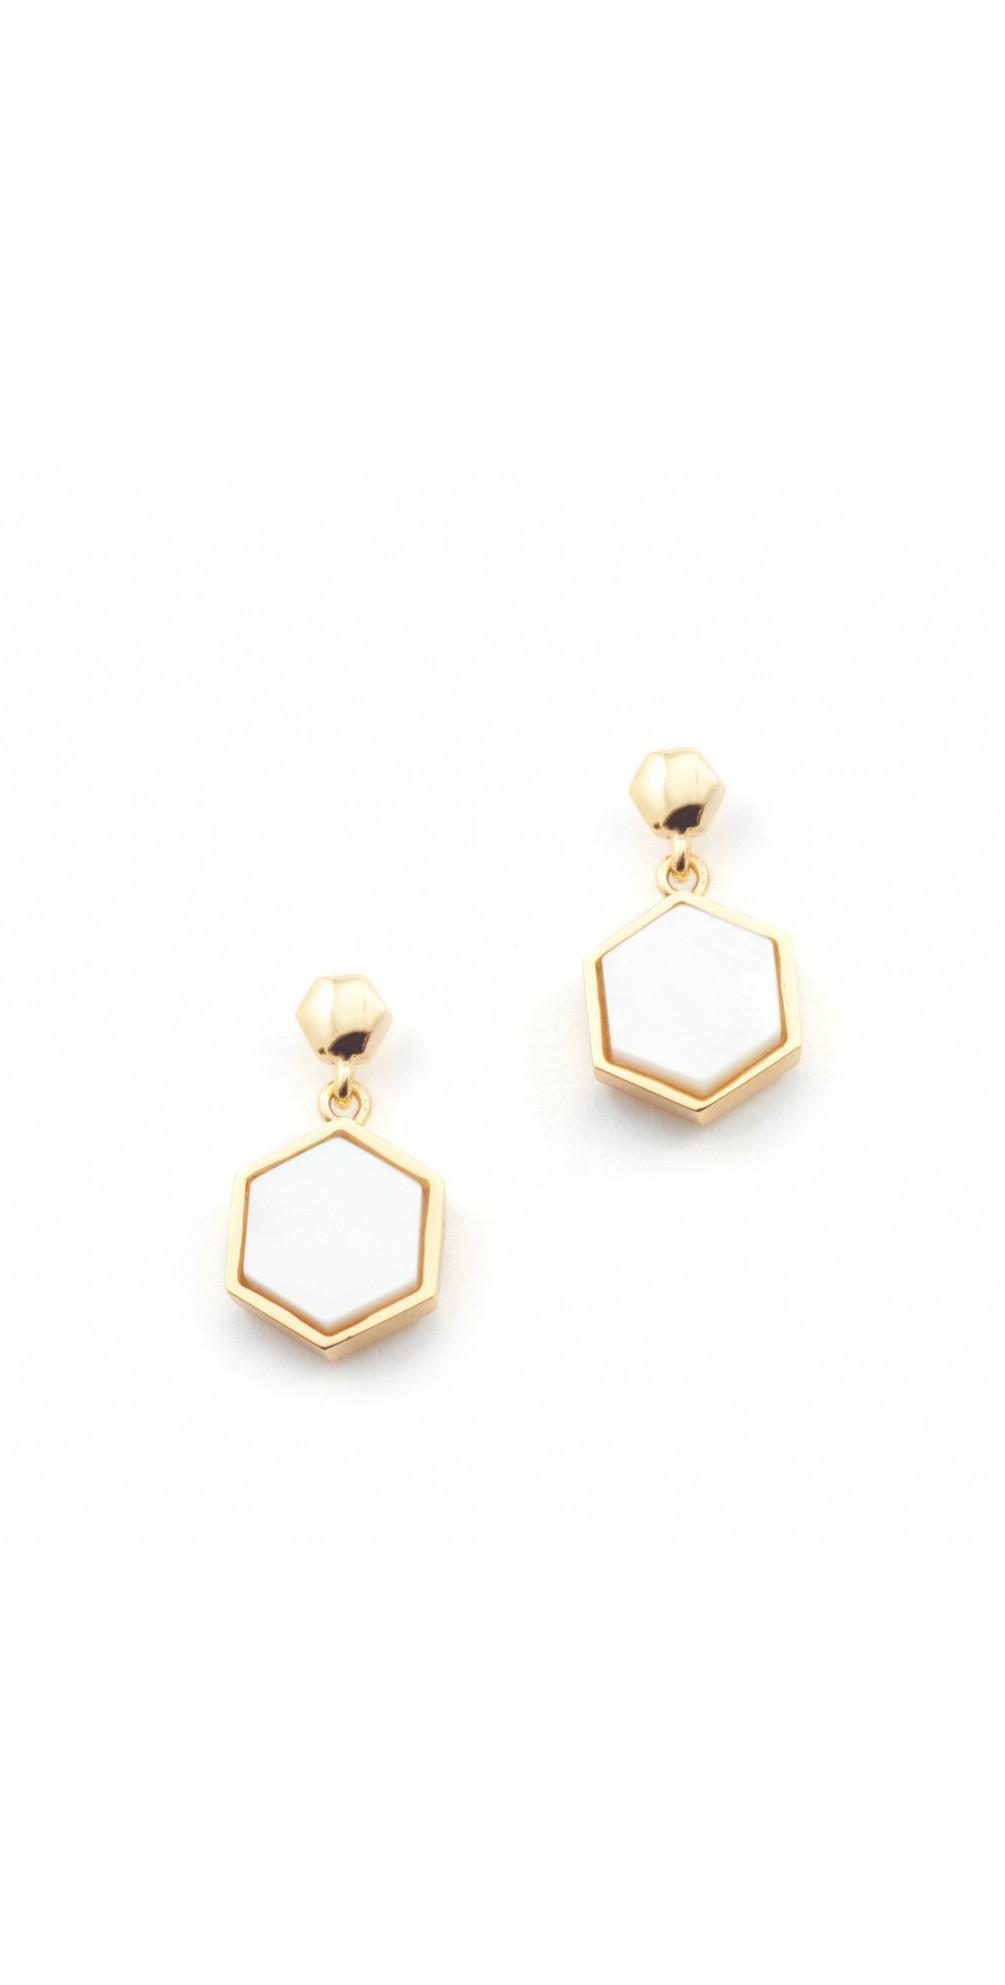 Hexagon Stud Earrings main image